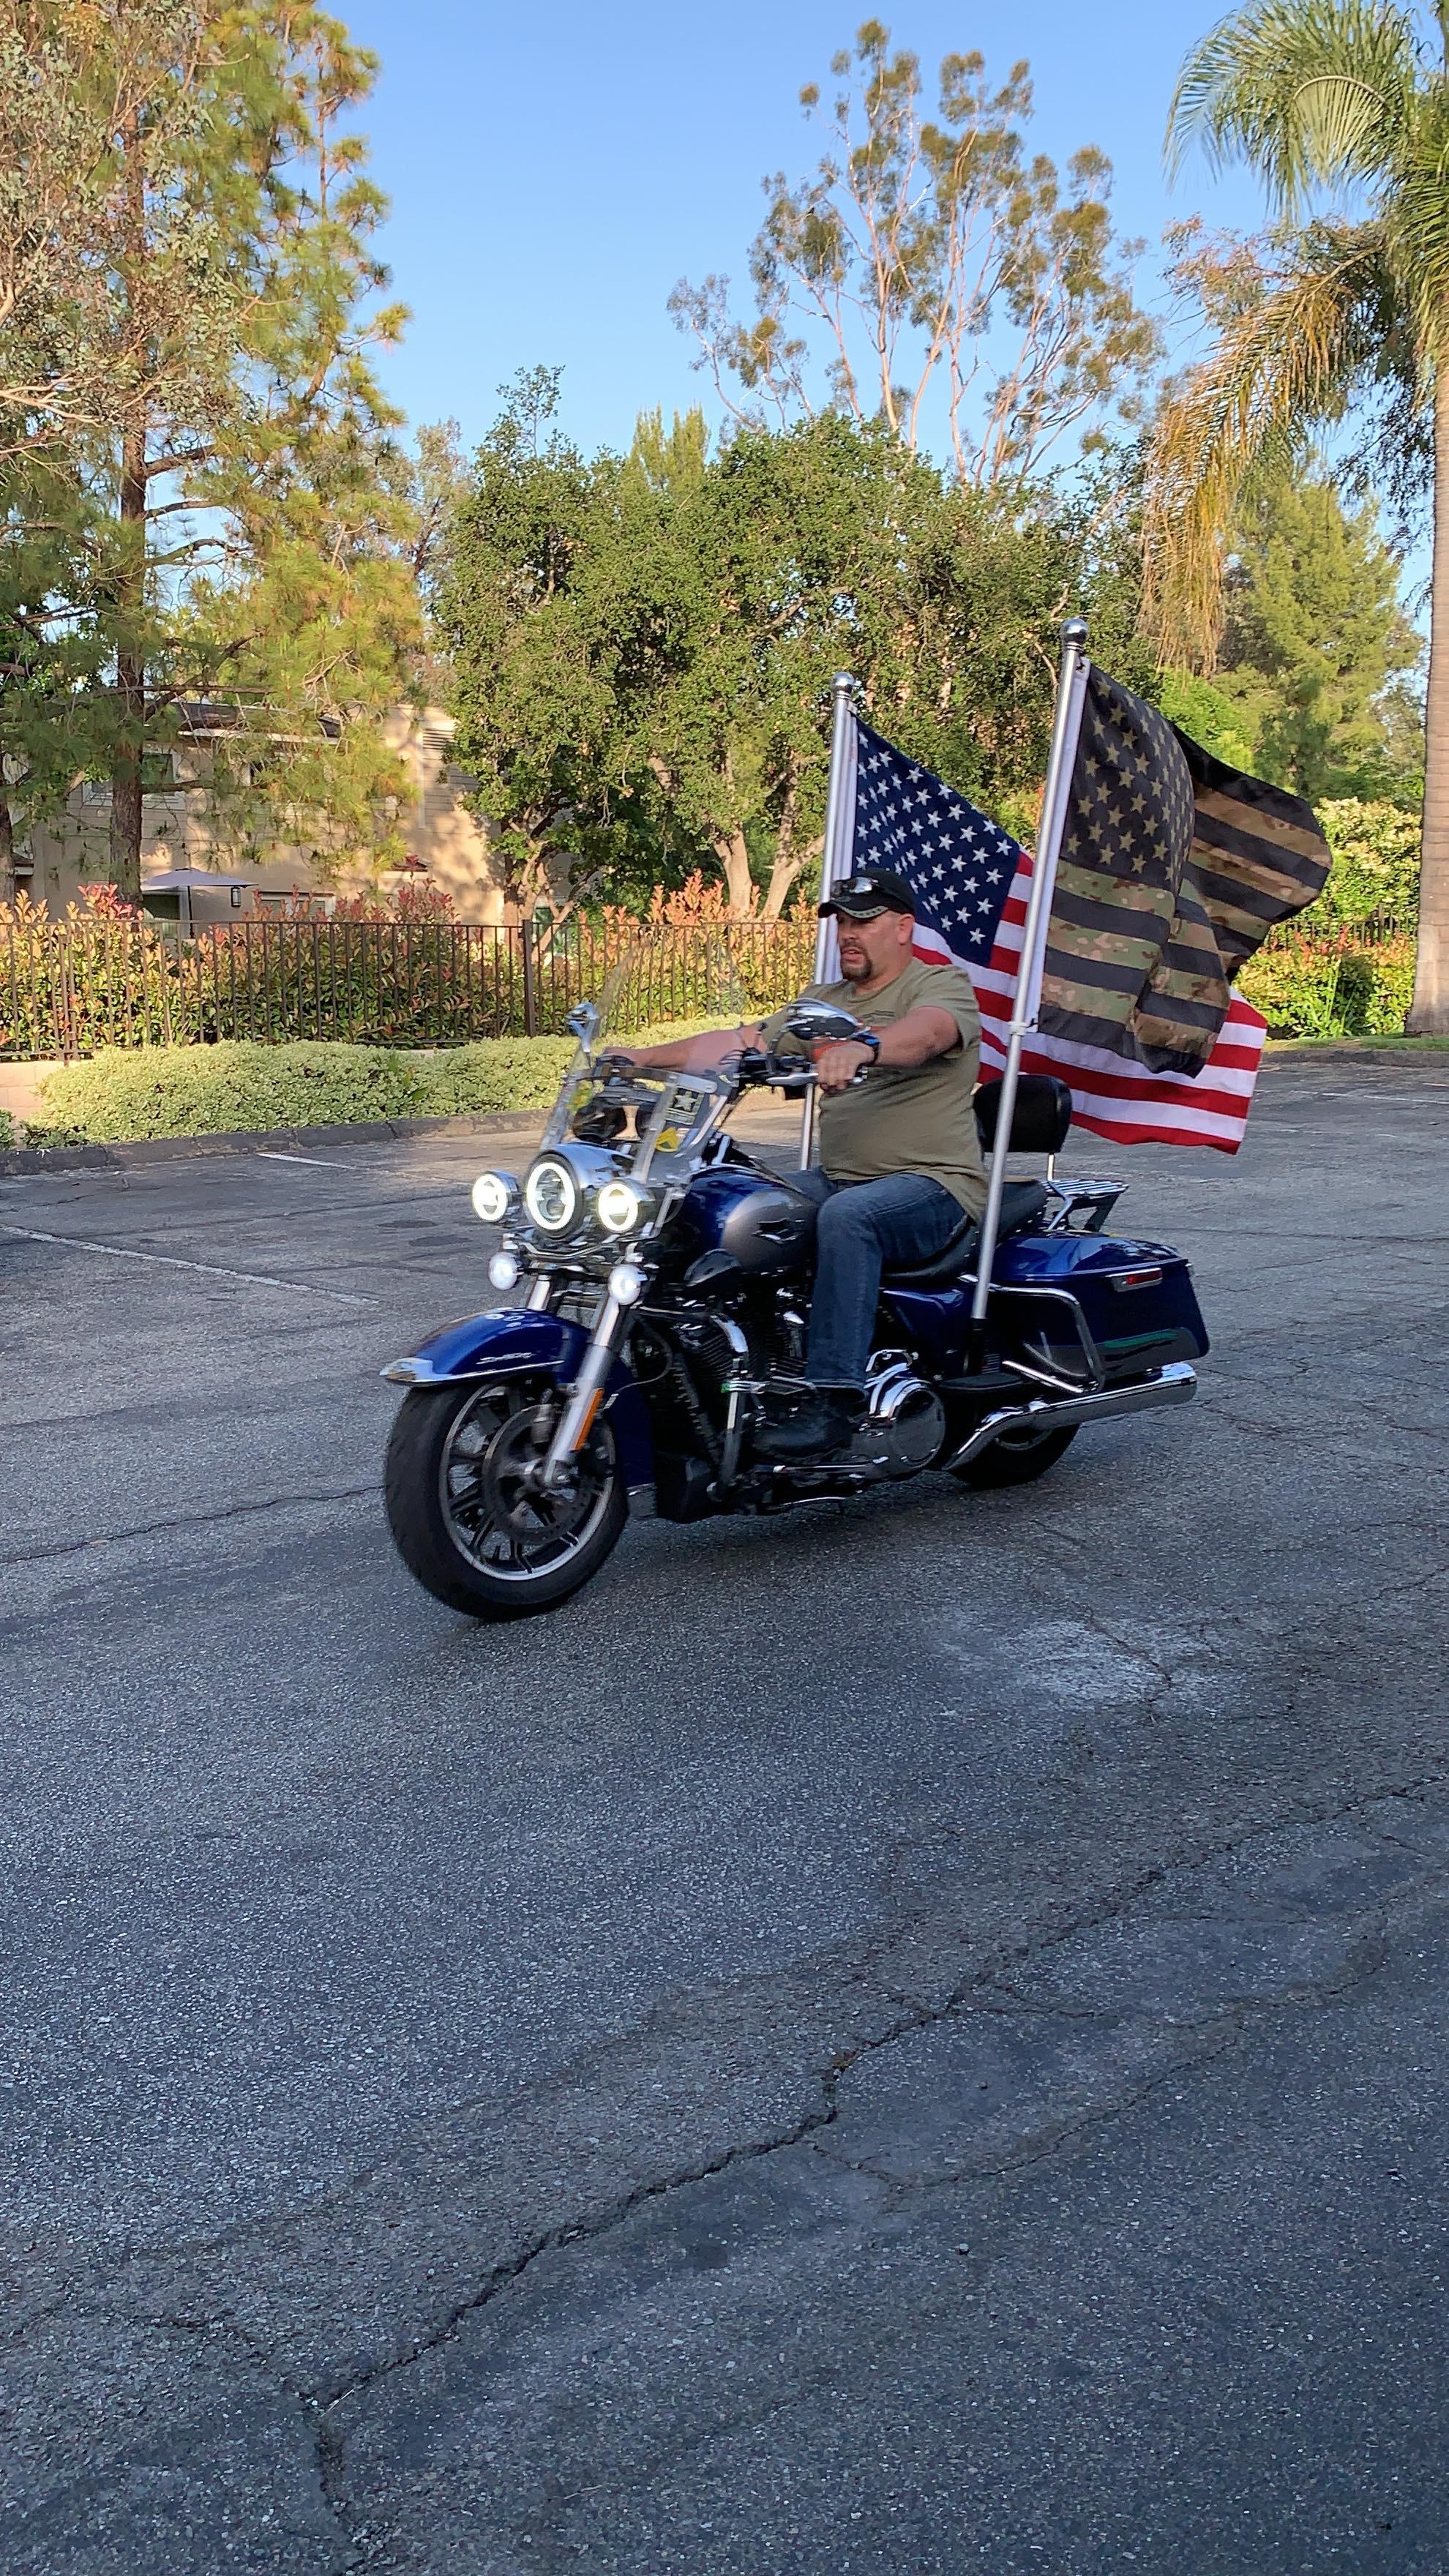 tconnerb-wamericanflag.jpeg